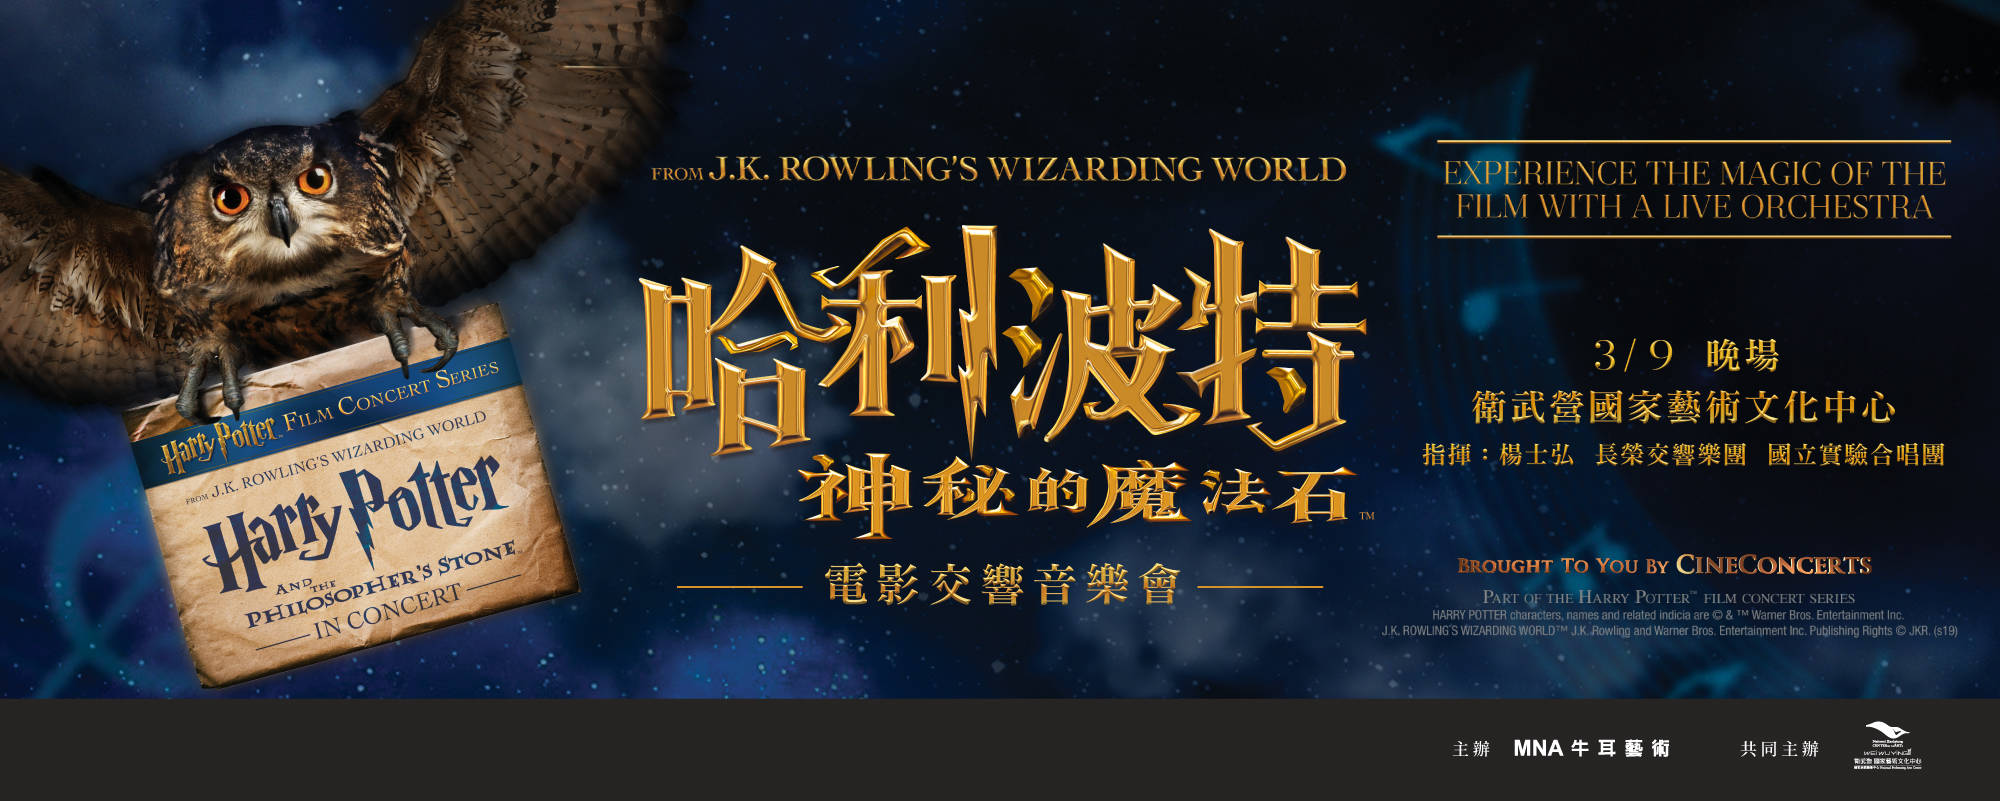 Harry Potter Film Concert Series - Programs | National